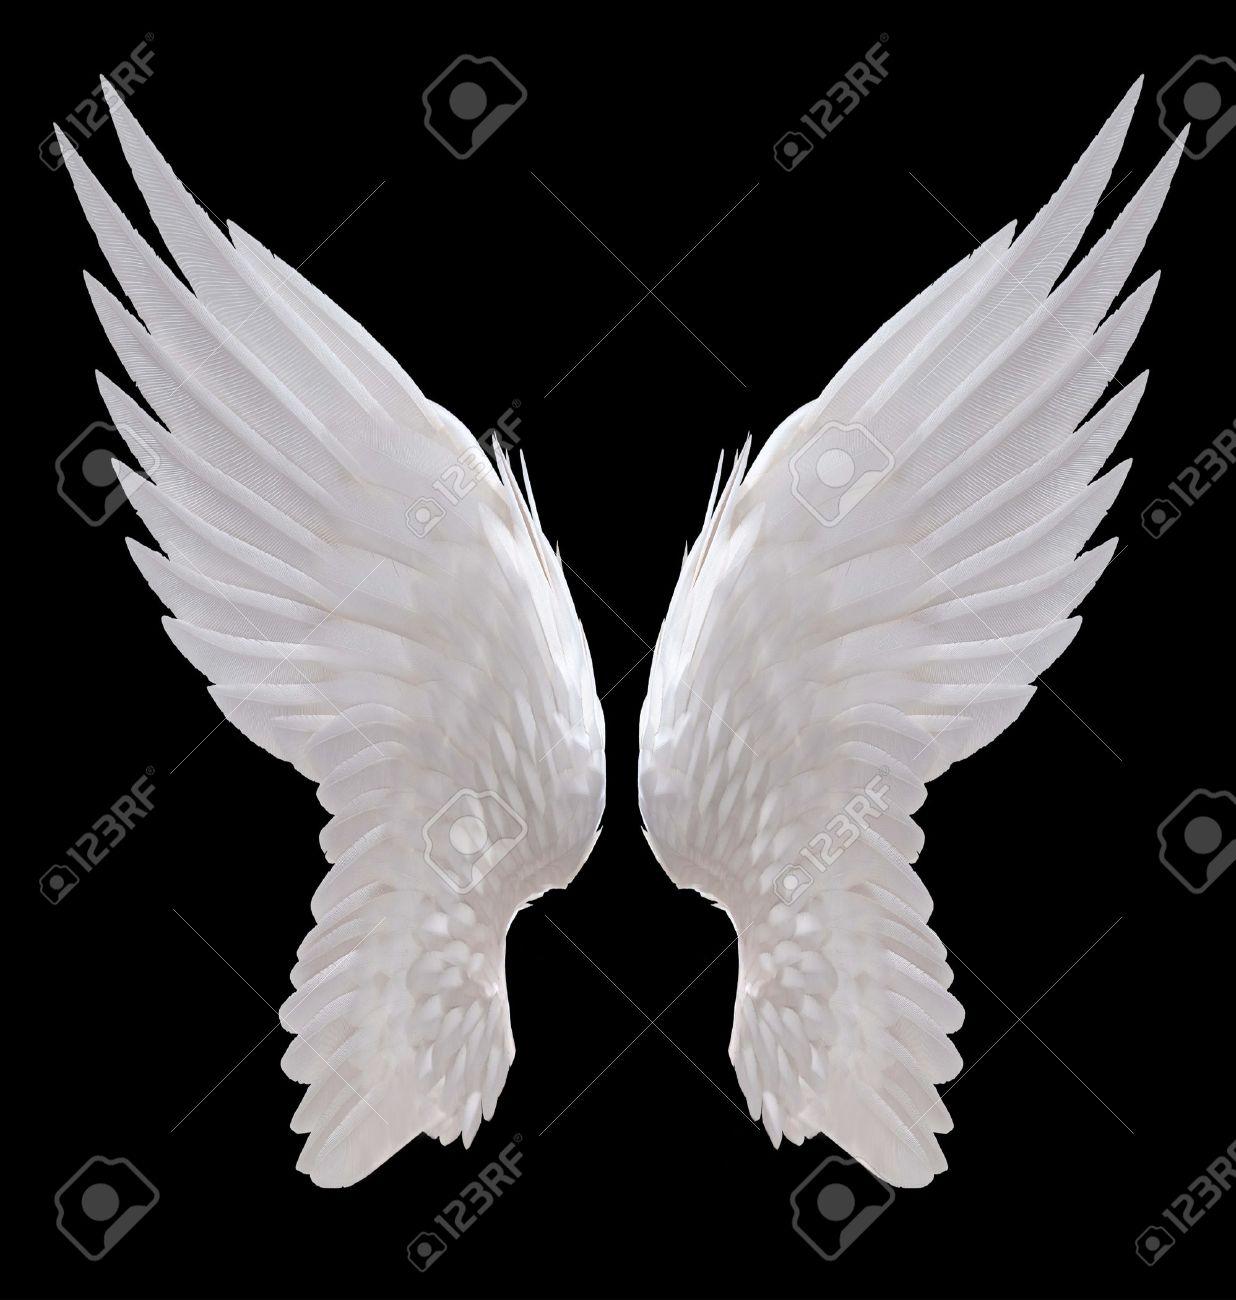 Angel Angel new foto